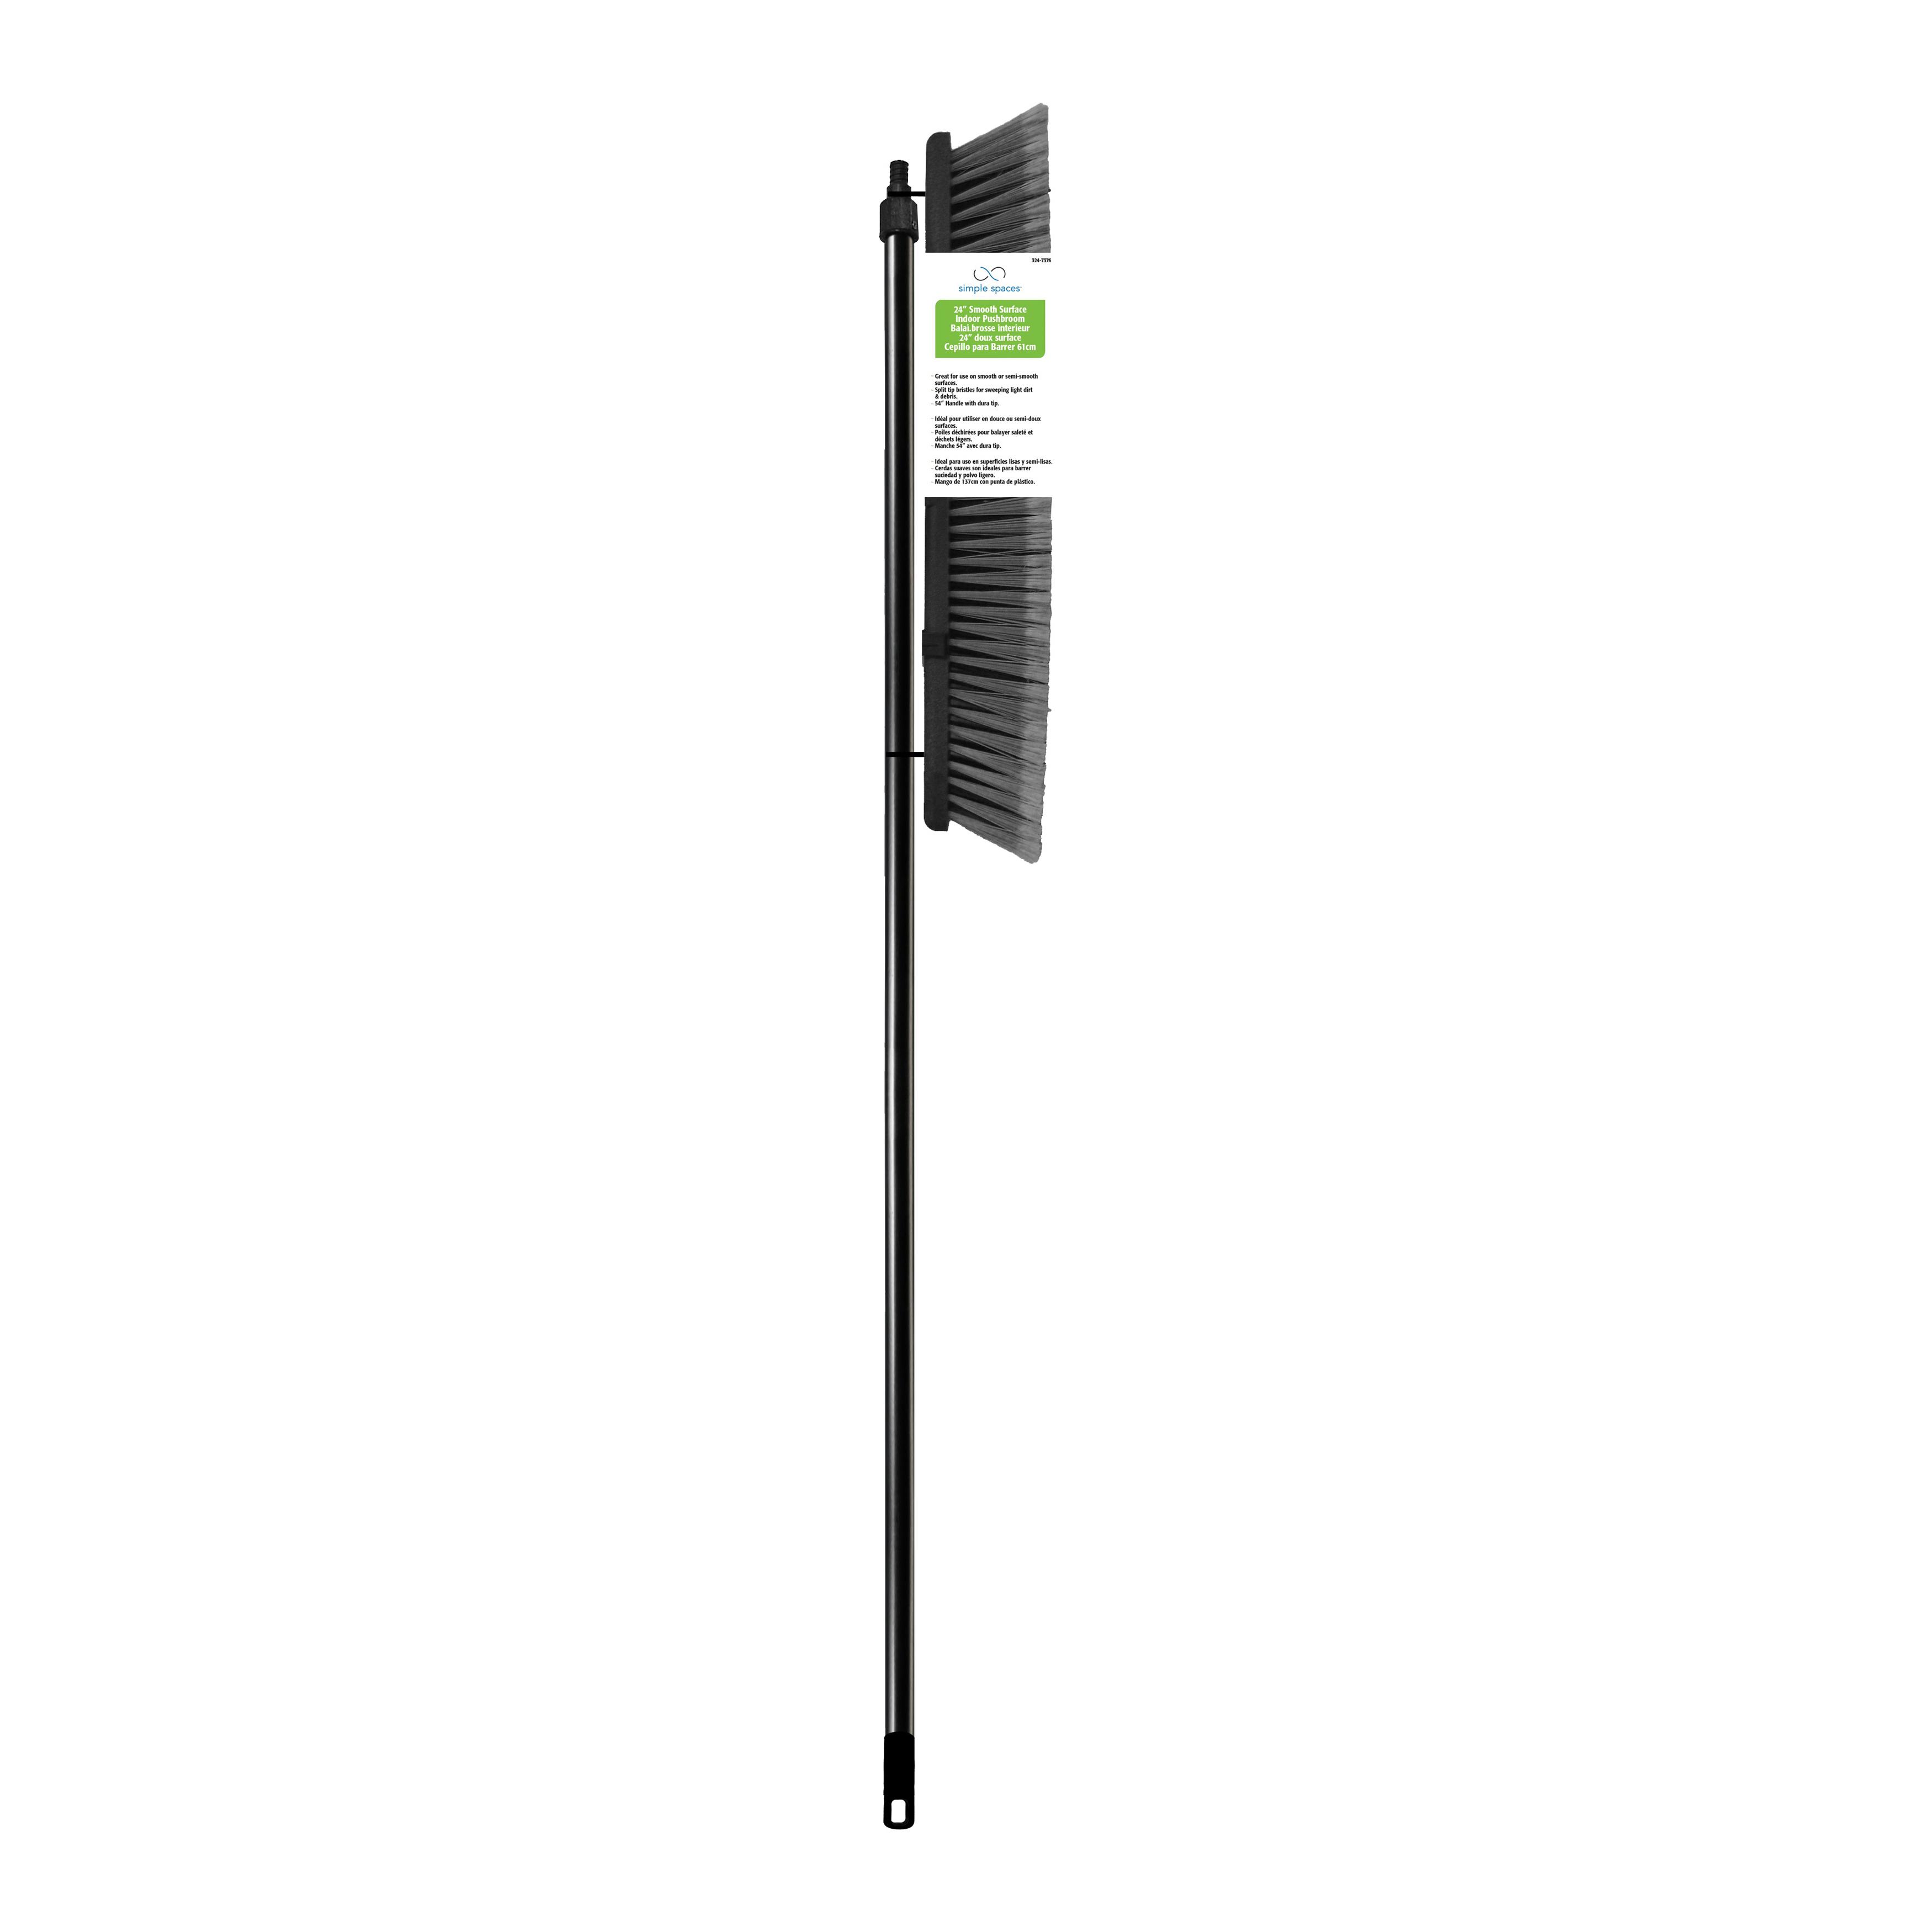 Picture of Simple Spaces 92010 Push Broom, 3-1/4 in L Trim, Natural Palmyra Fiber Bristle